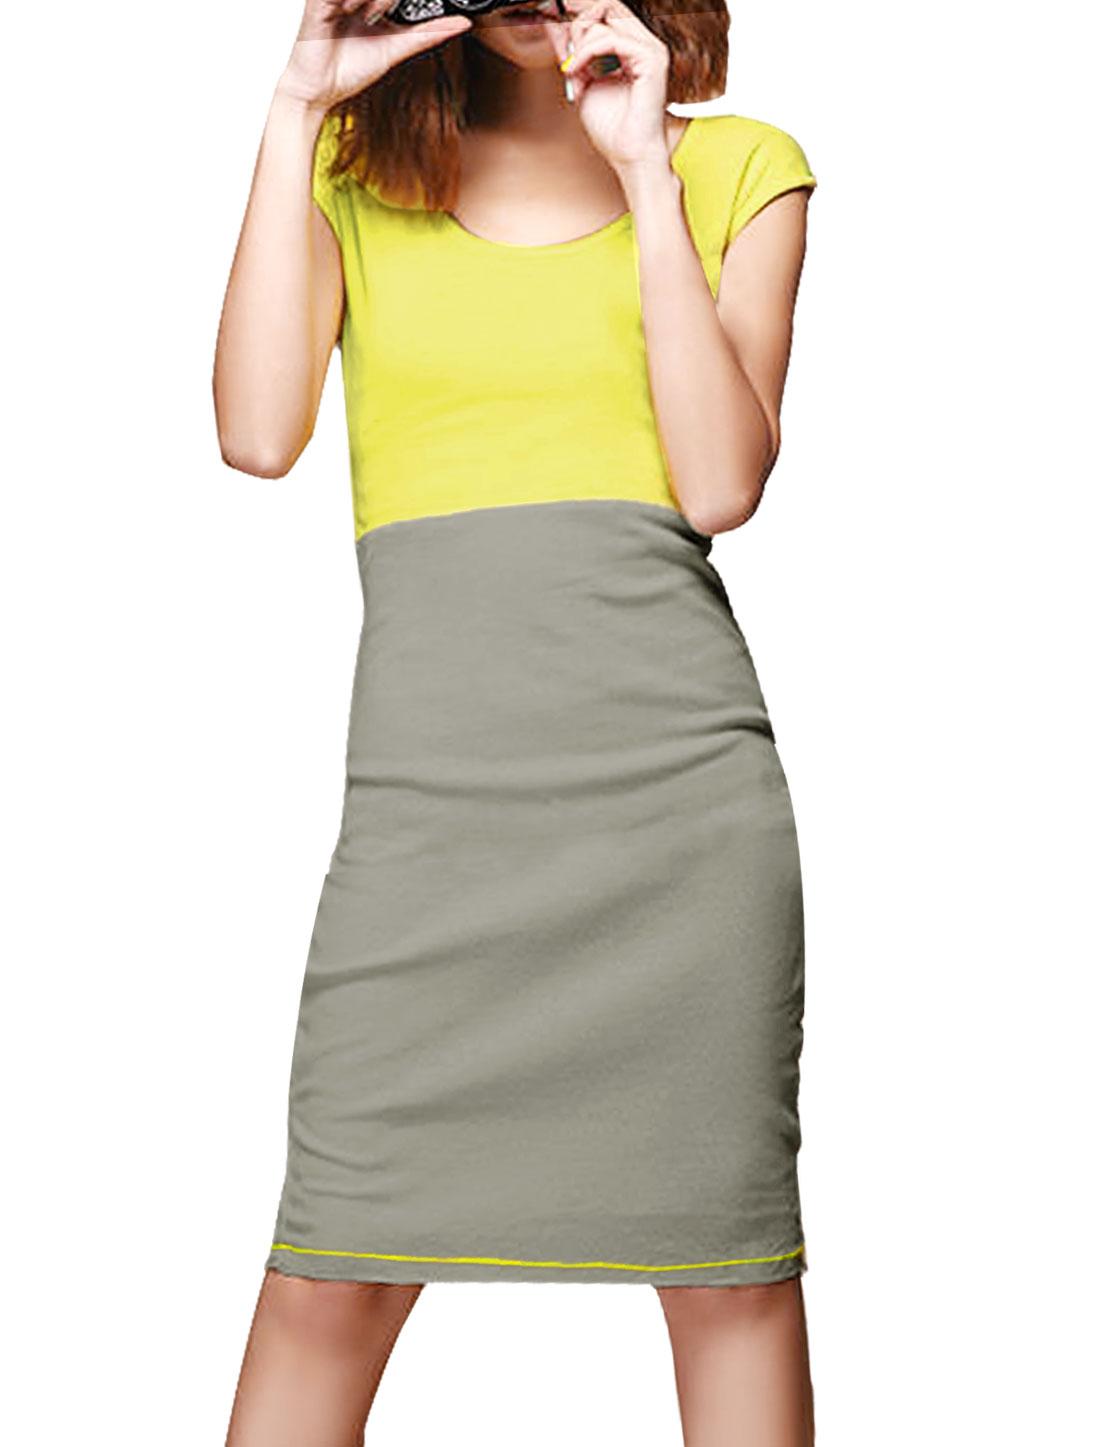 Woman Chic Scoop Neck Sleeveless Yellow Light Gray Dress S